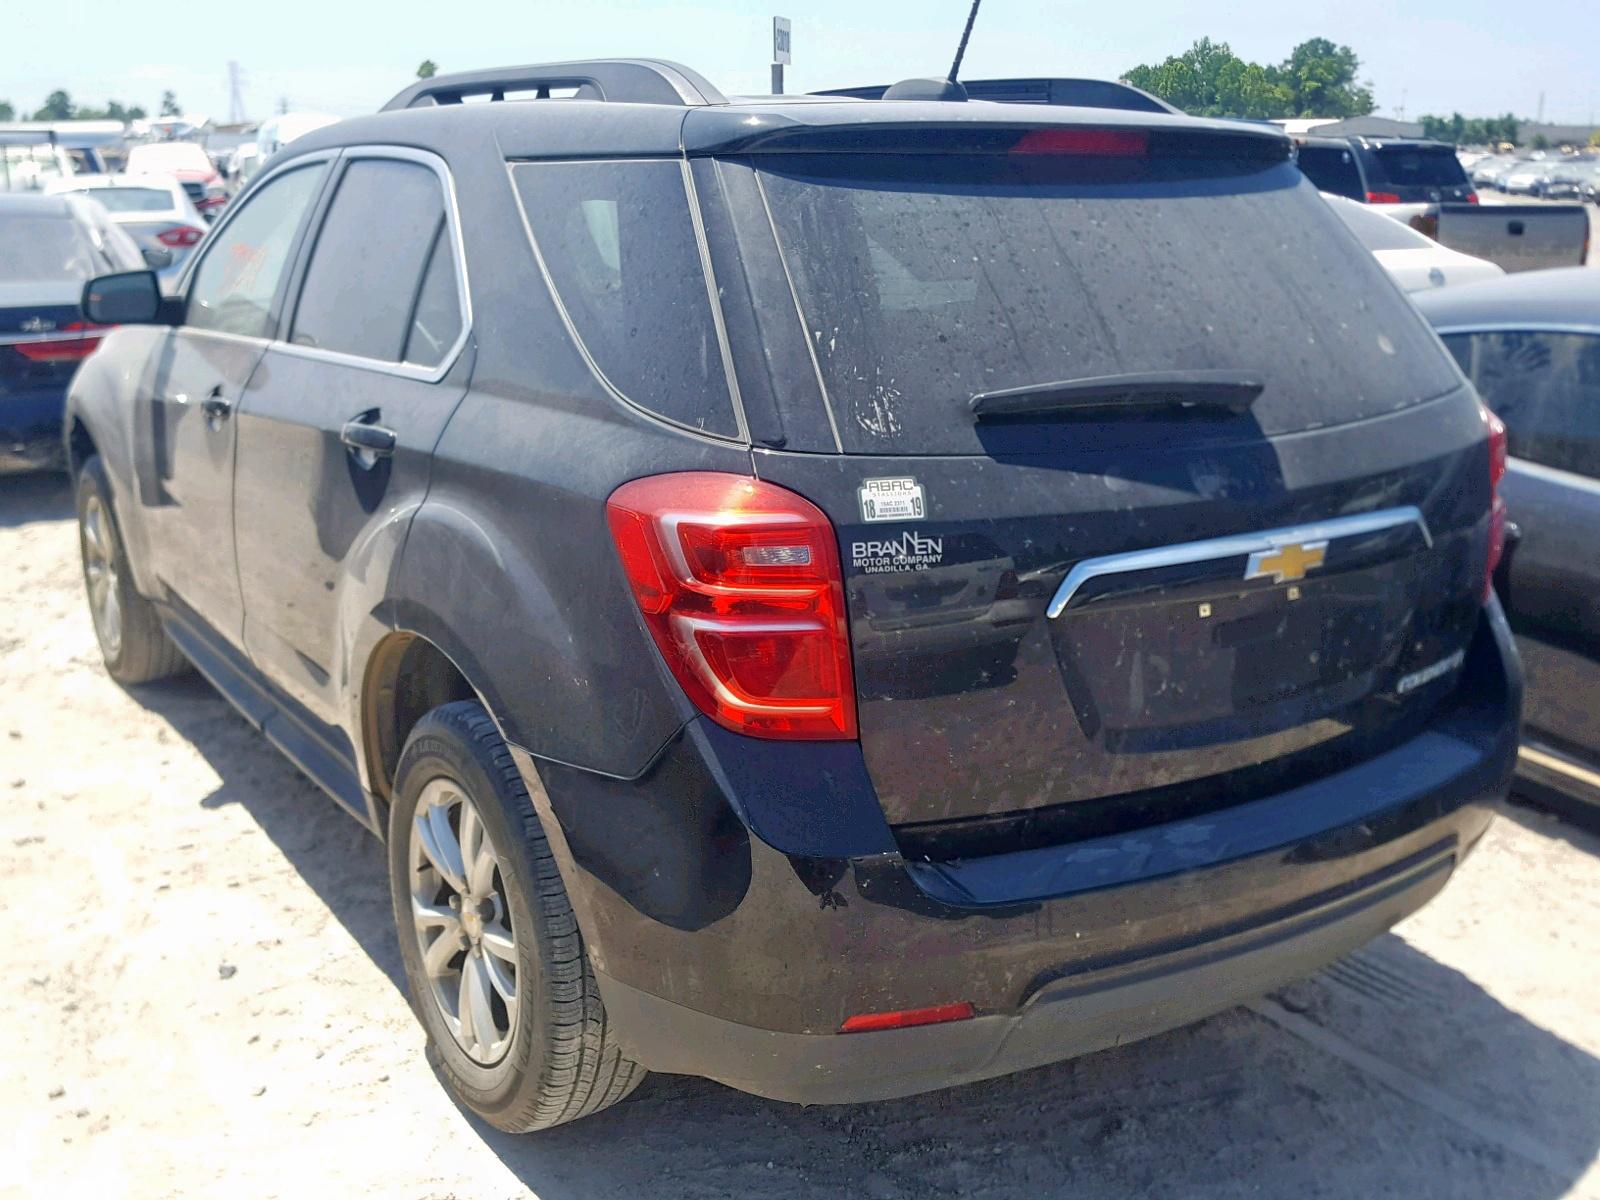 2016 Chevrolet Equinox Lt 2.4L [Angle] View